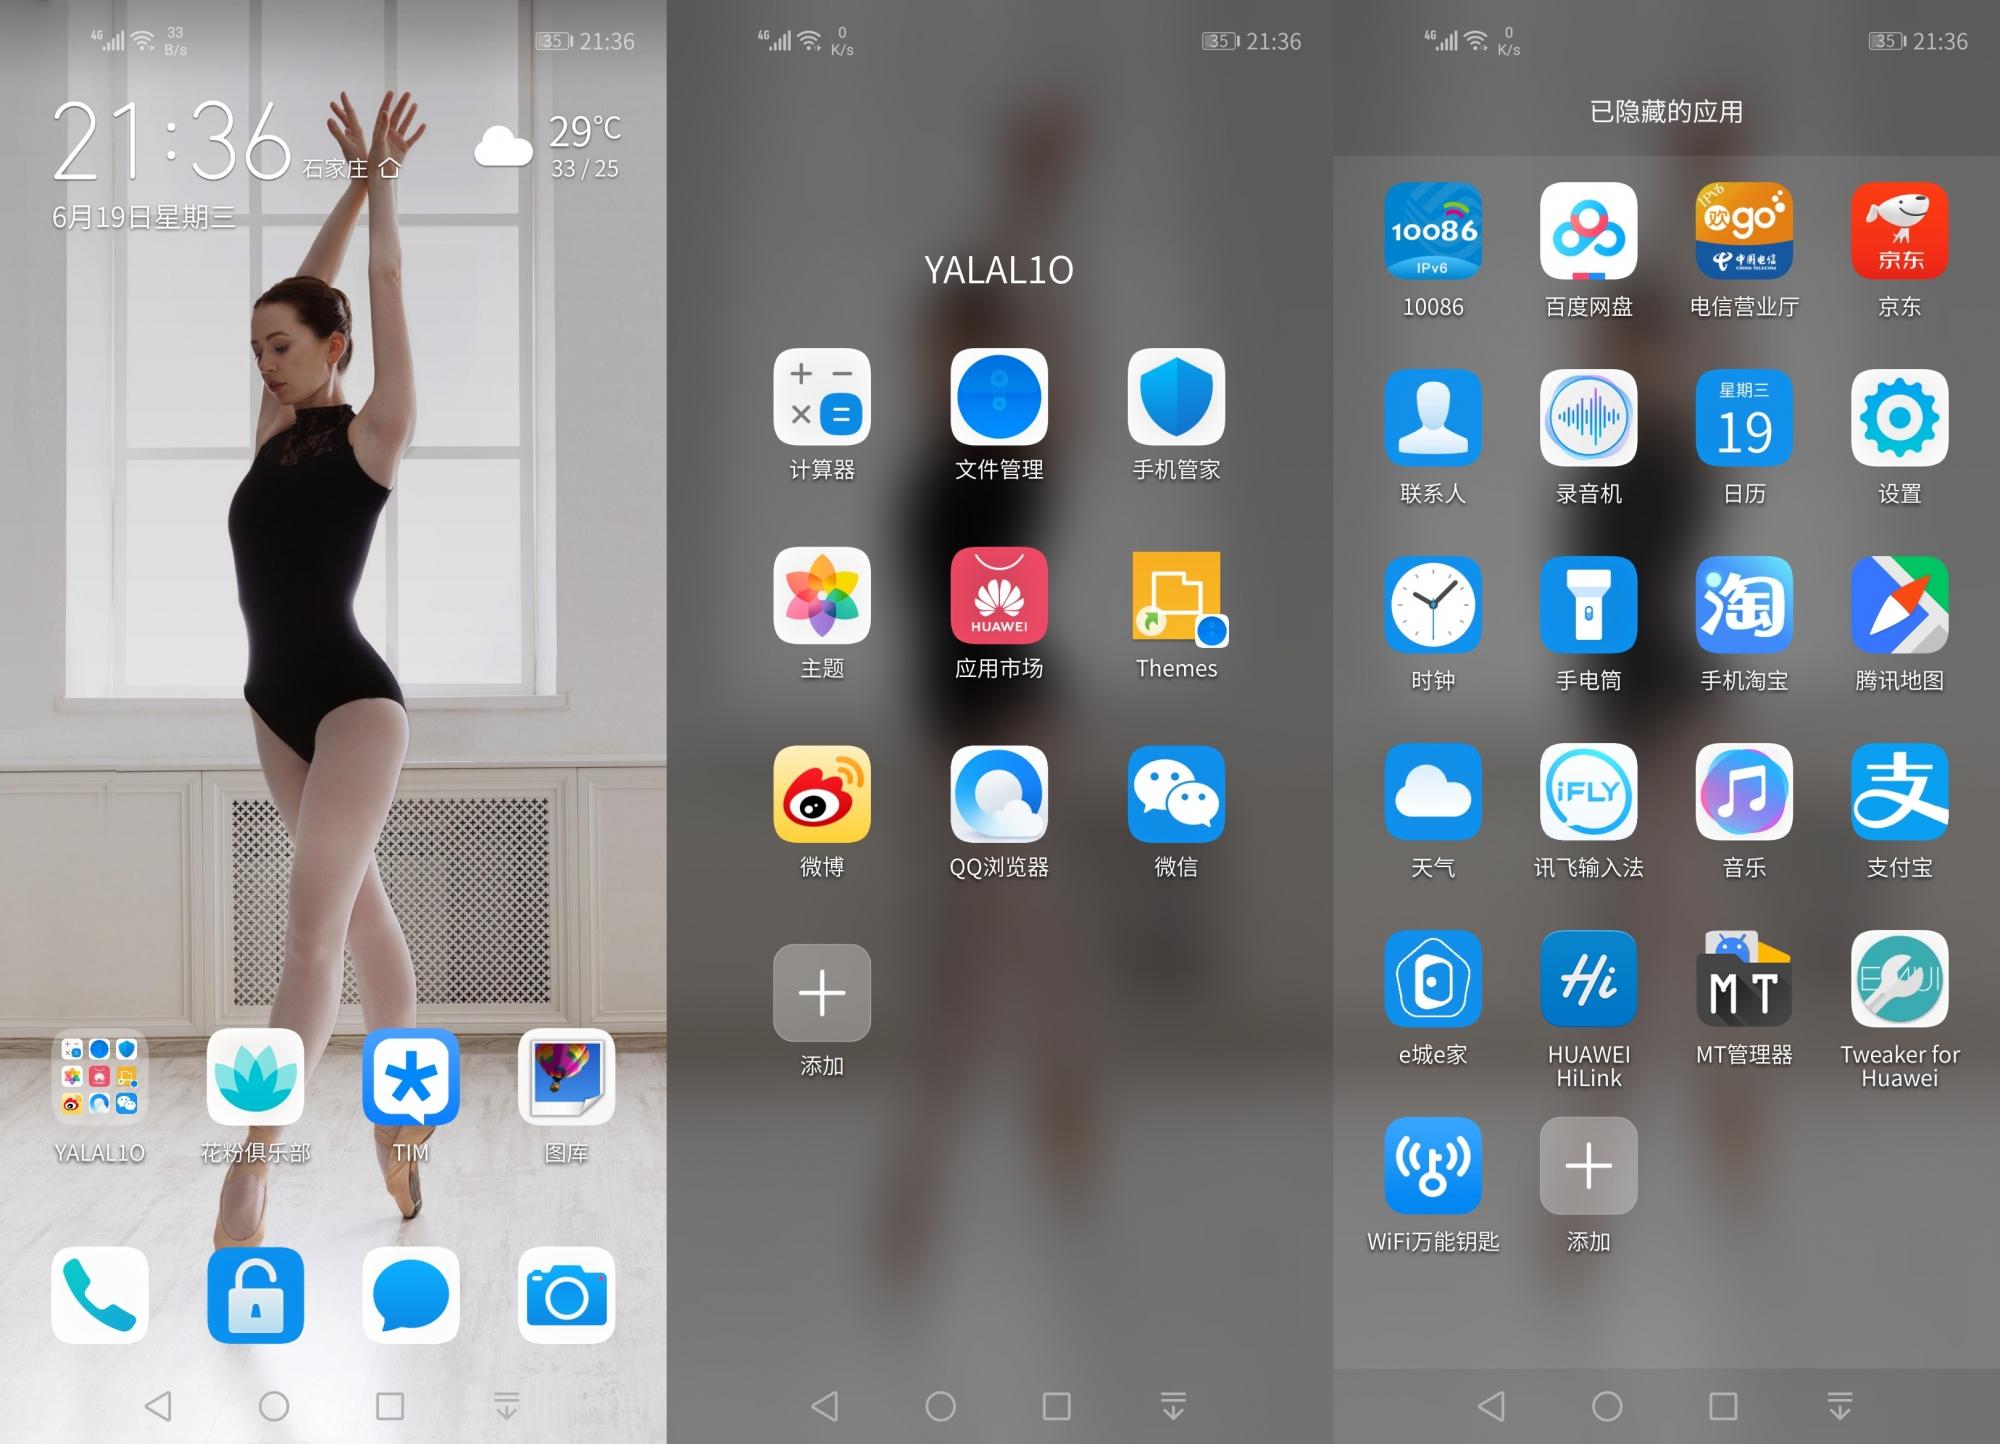 Screenshot_20190619_213636_com.huawei.android.lau.jpg